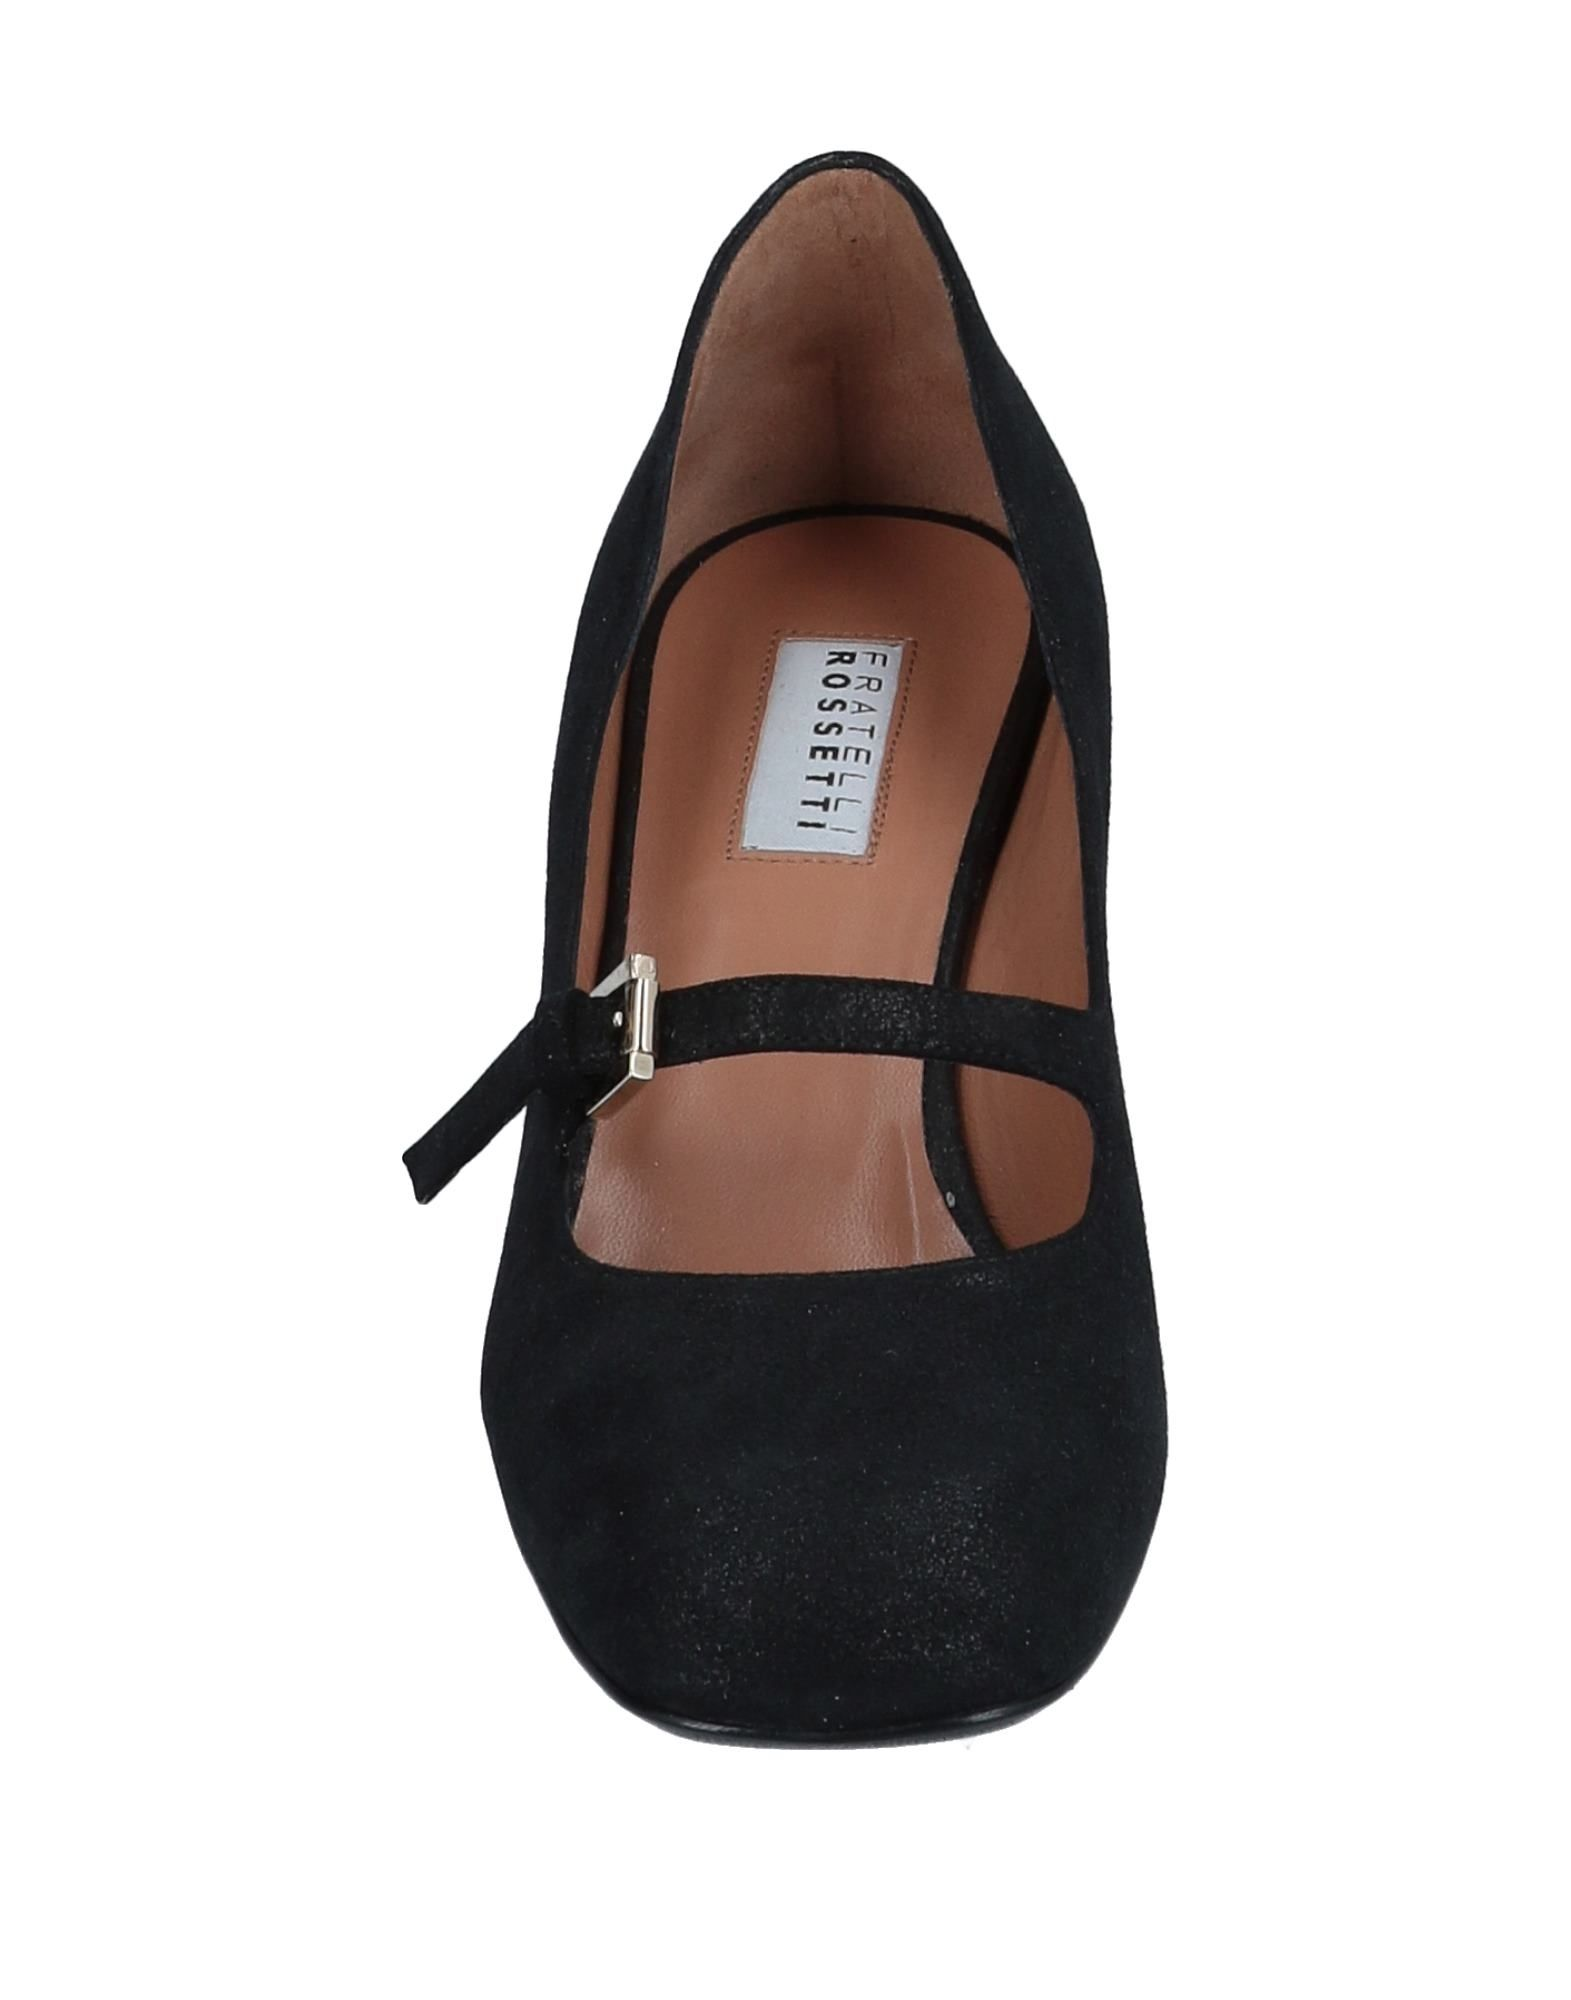 Rabatt Damen Schuhe Fratelli Rossetti Pumps Damen Rabatt  11548997IF 6bdbf1